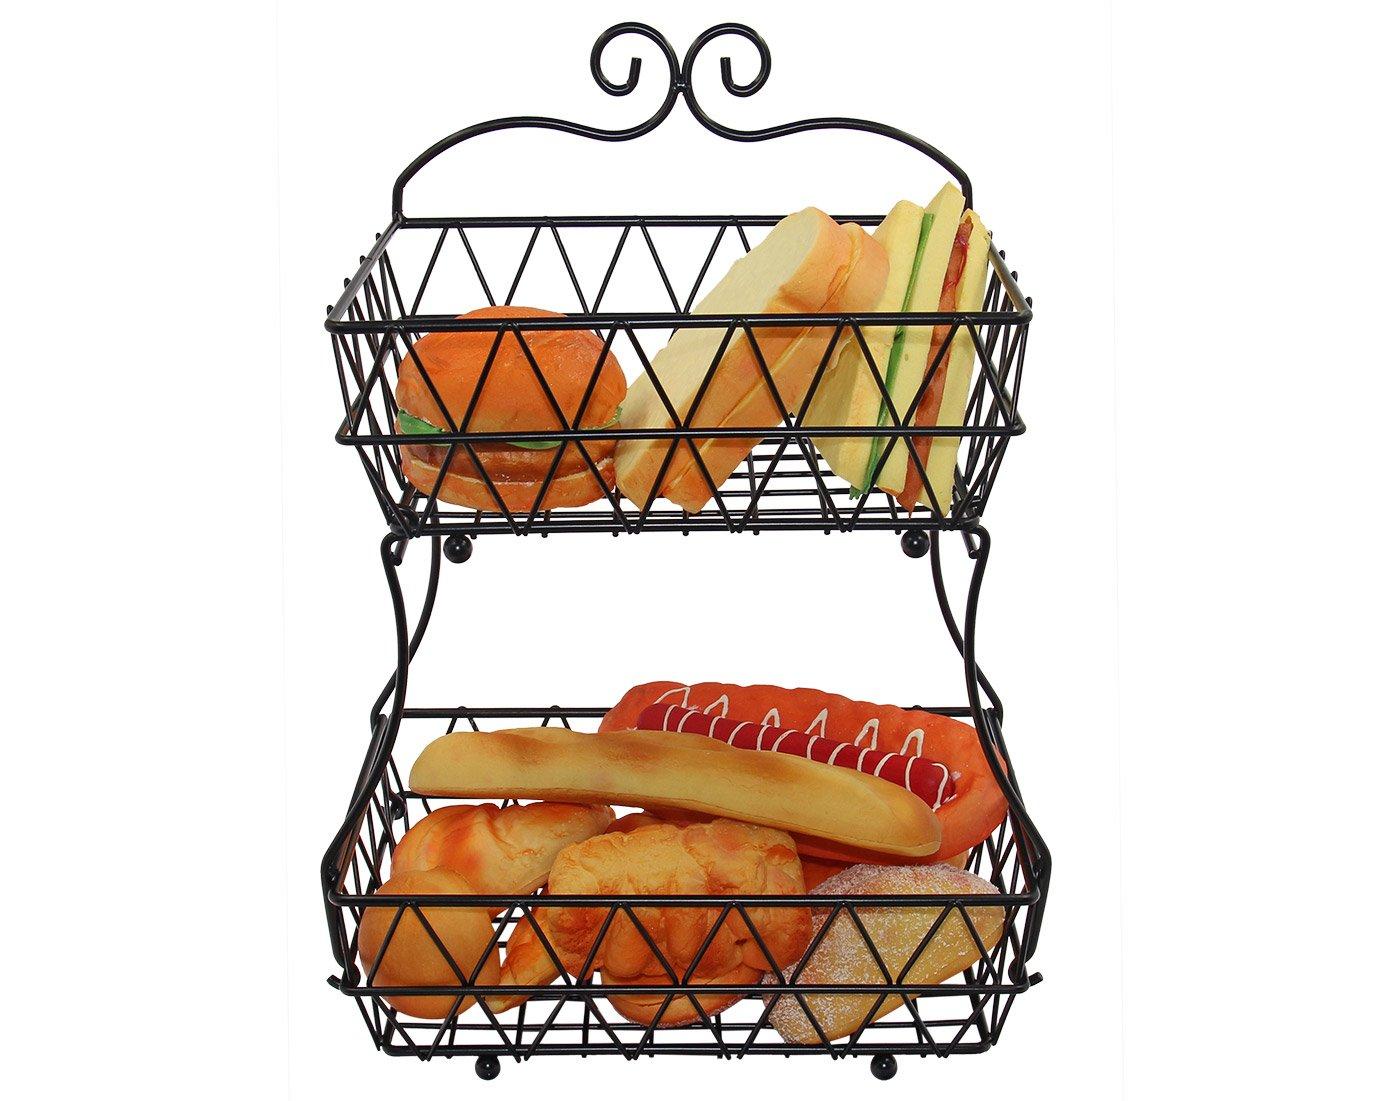 IZLIF 2 Tier Bread Fruit Basket Storage Display Stand Rack with Screws Free Design- Black